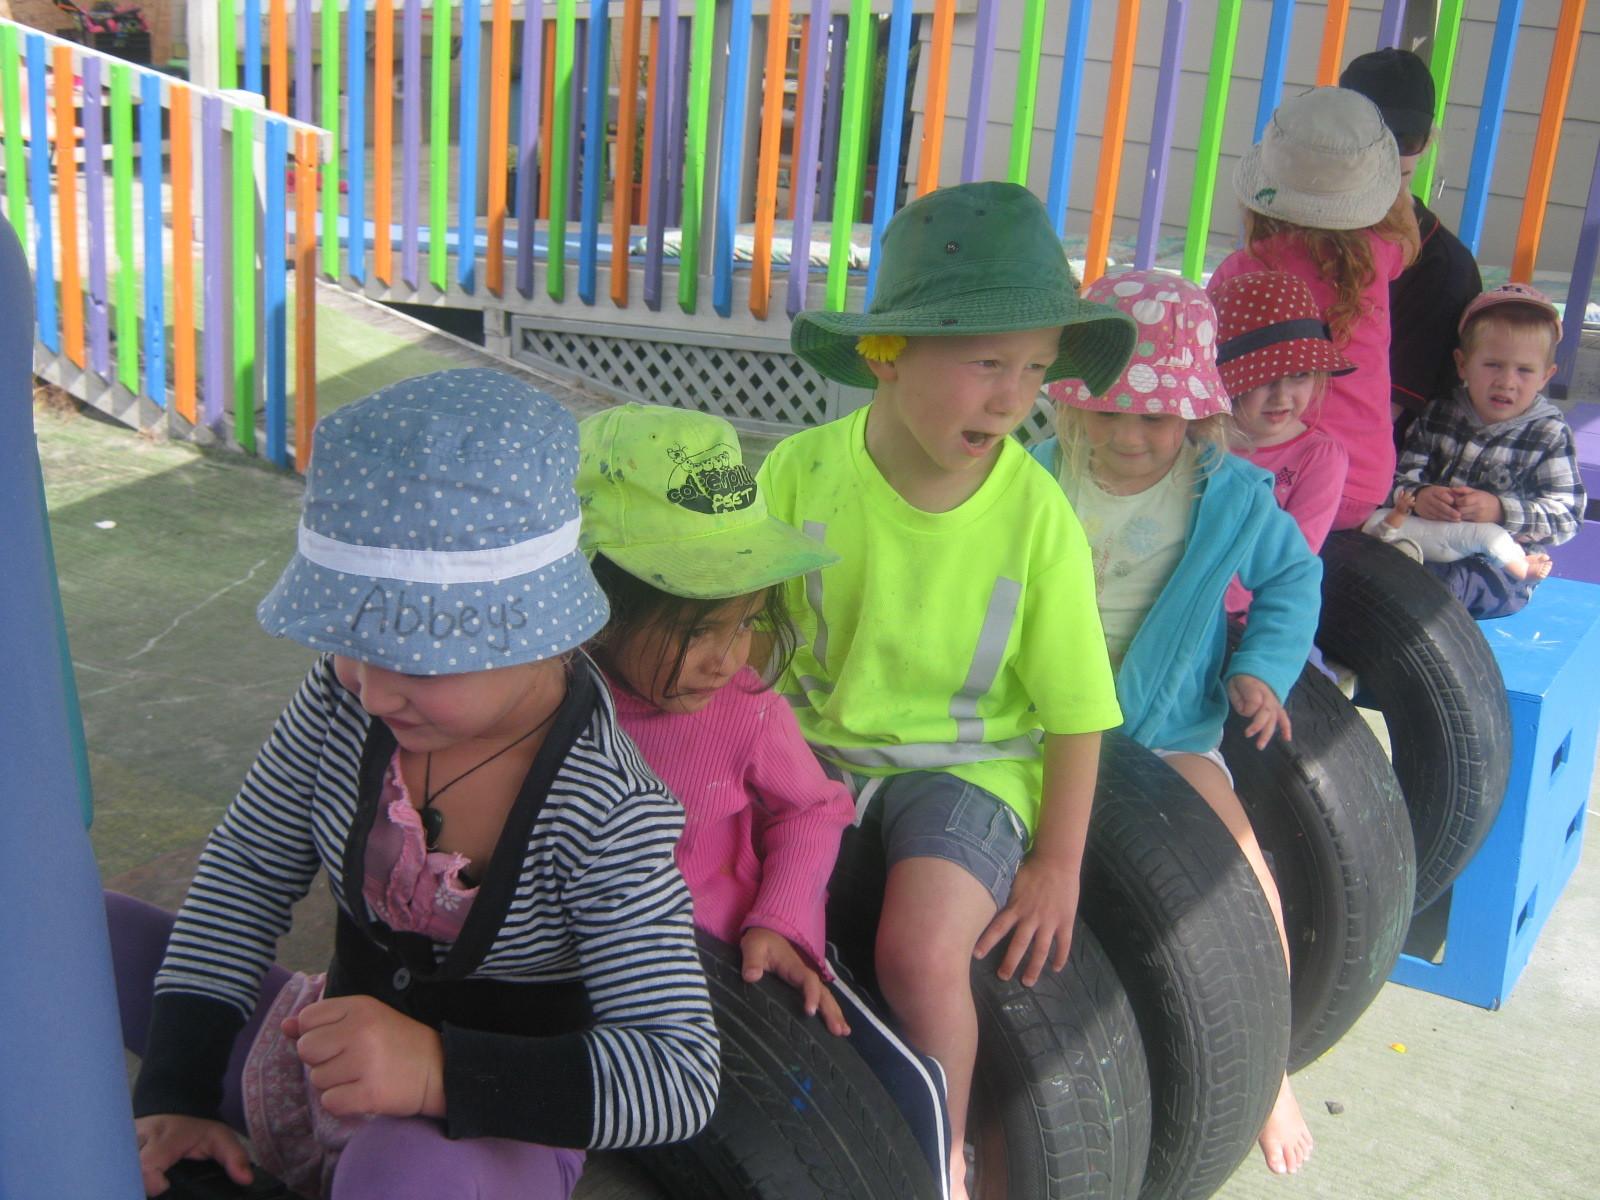 Staff at child care centre in Tauranga & Putaruru